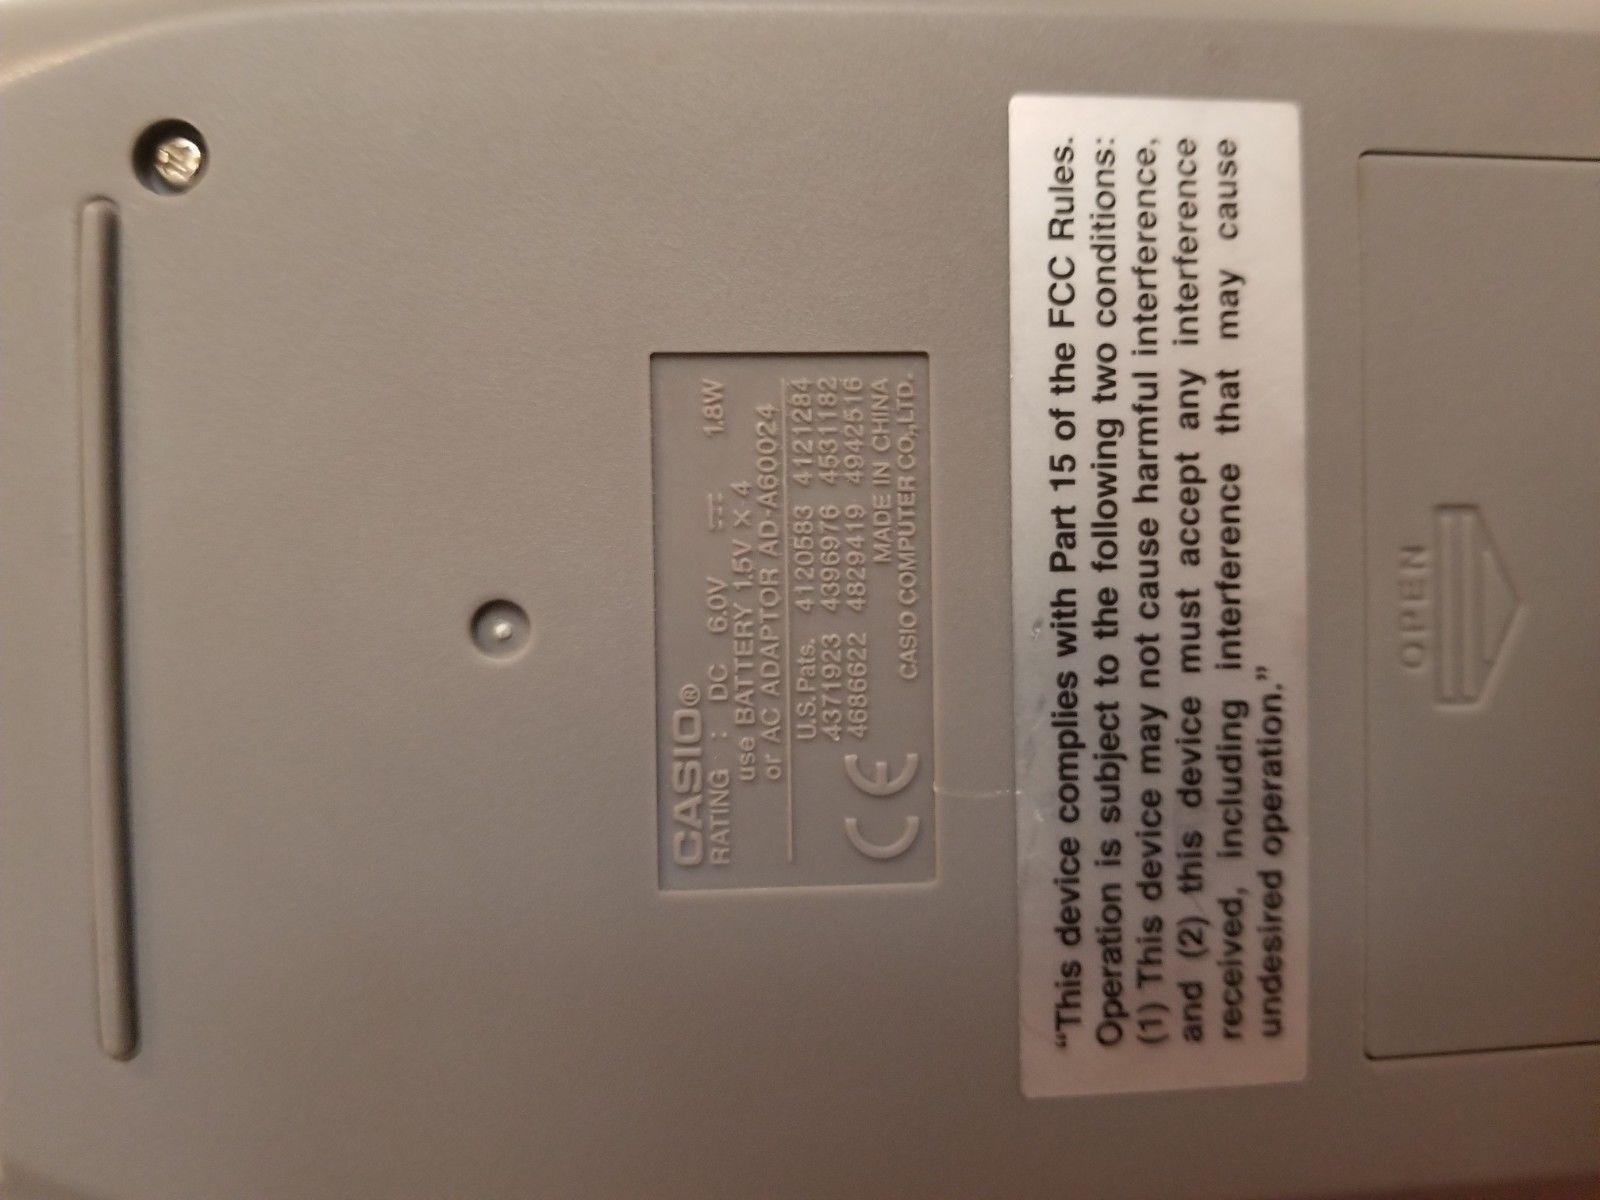 casio printing calculator image 4